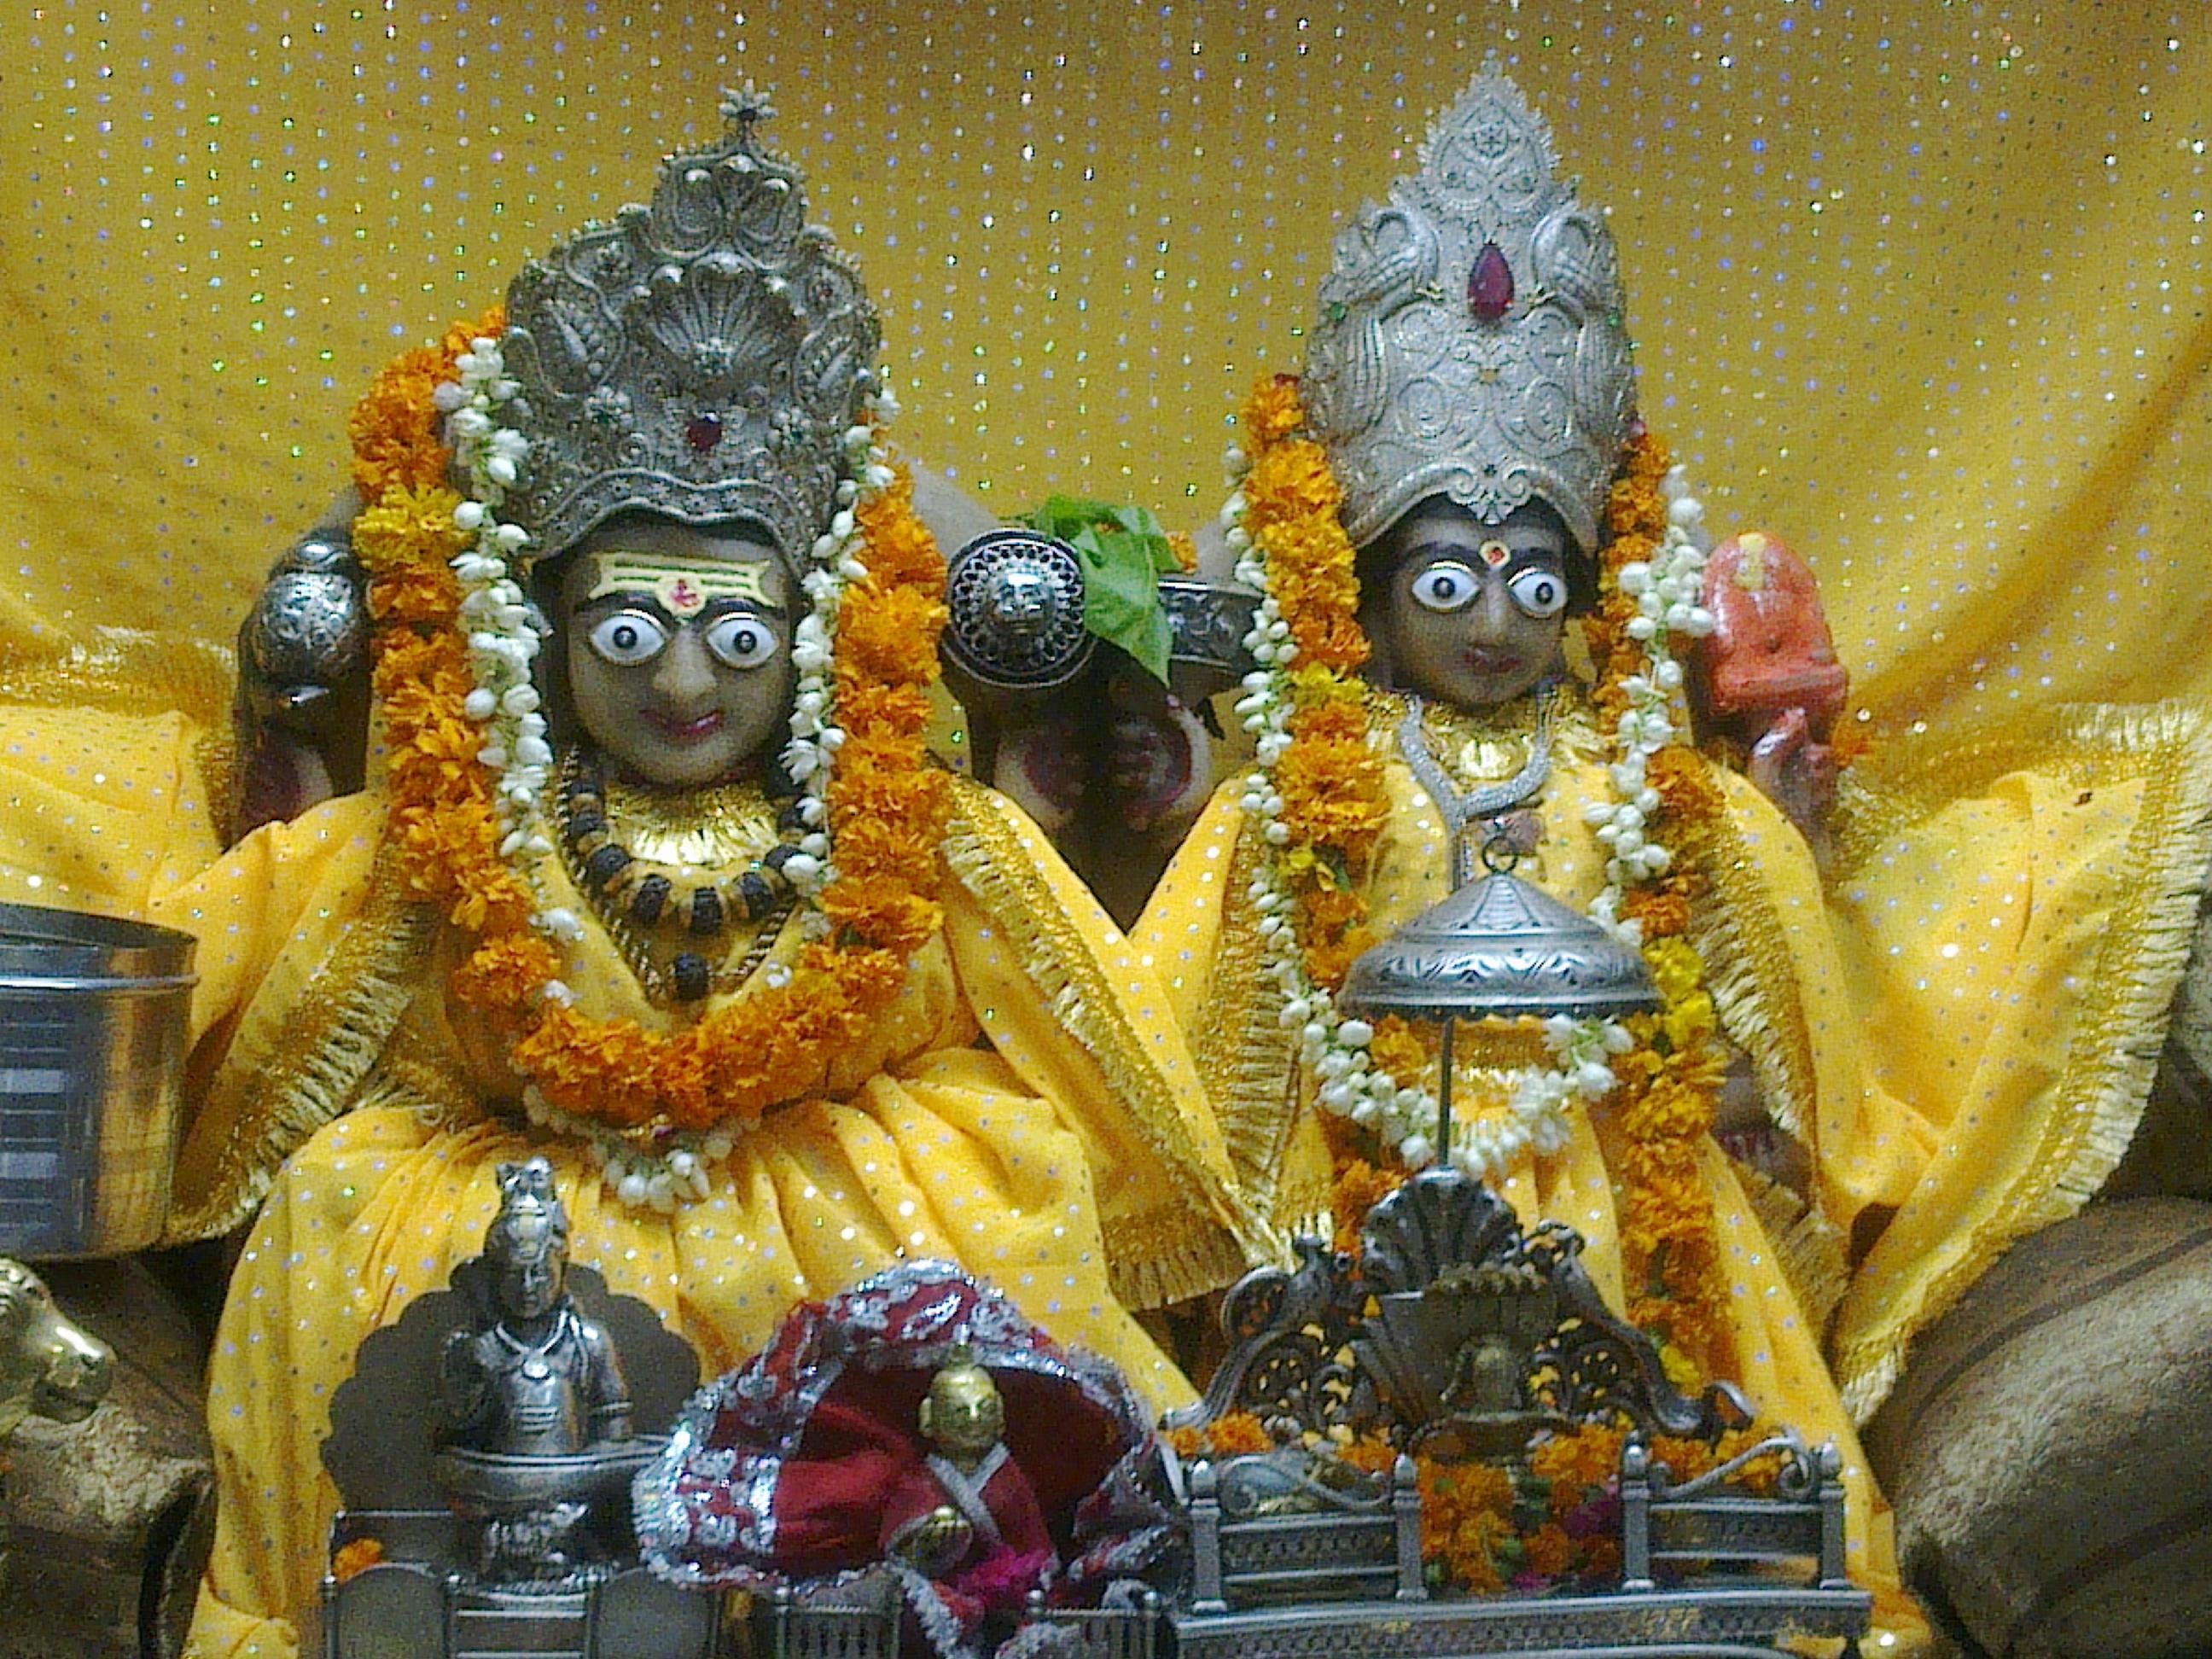 Gauri shankar temple in Delhi